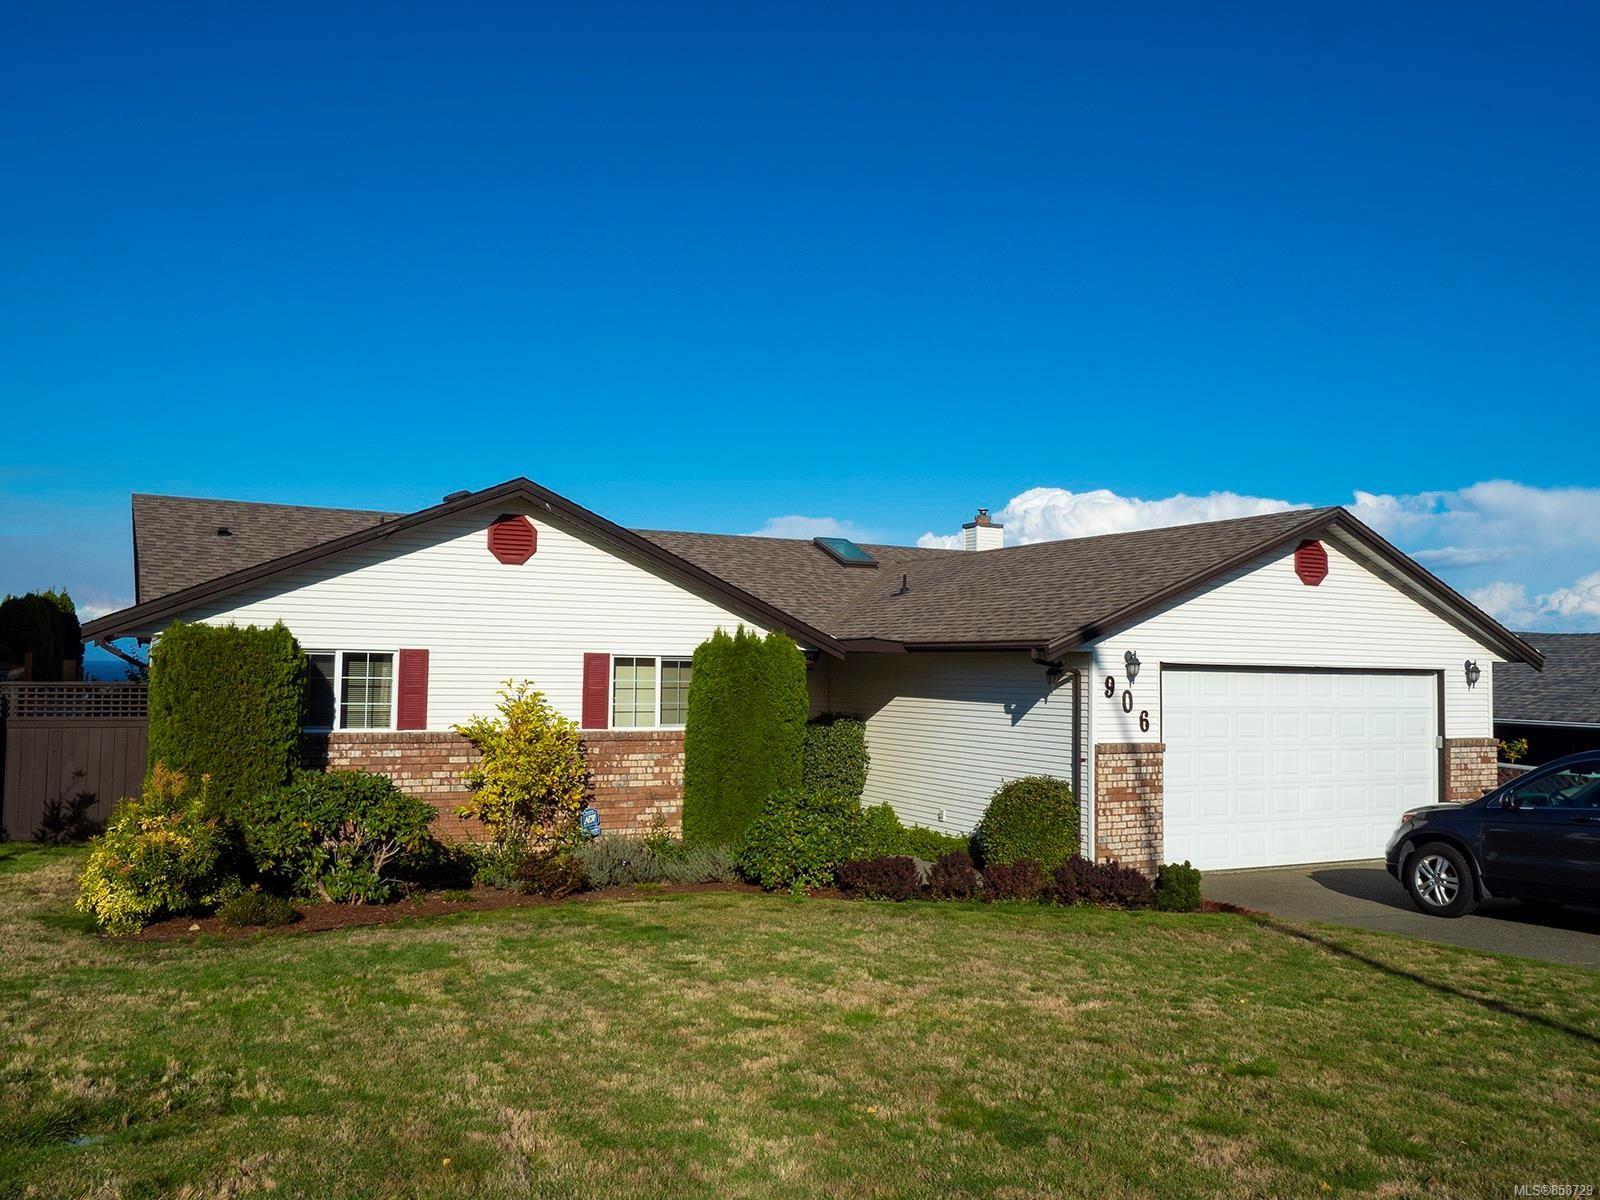 Main Photo: 906 Cassandra Pl in : Na North Nanaimo House for sale (Nanaimo)  : MLS®# 858729